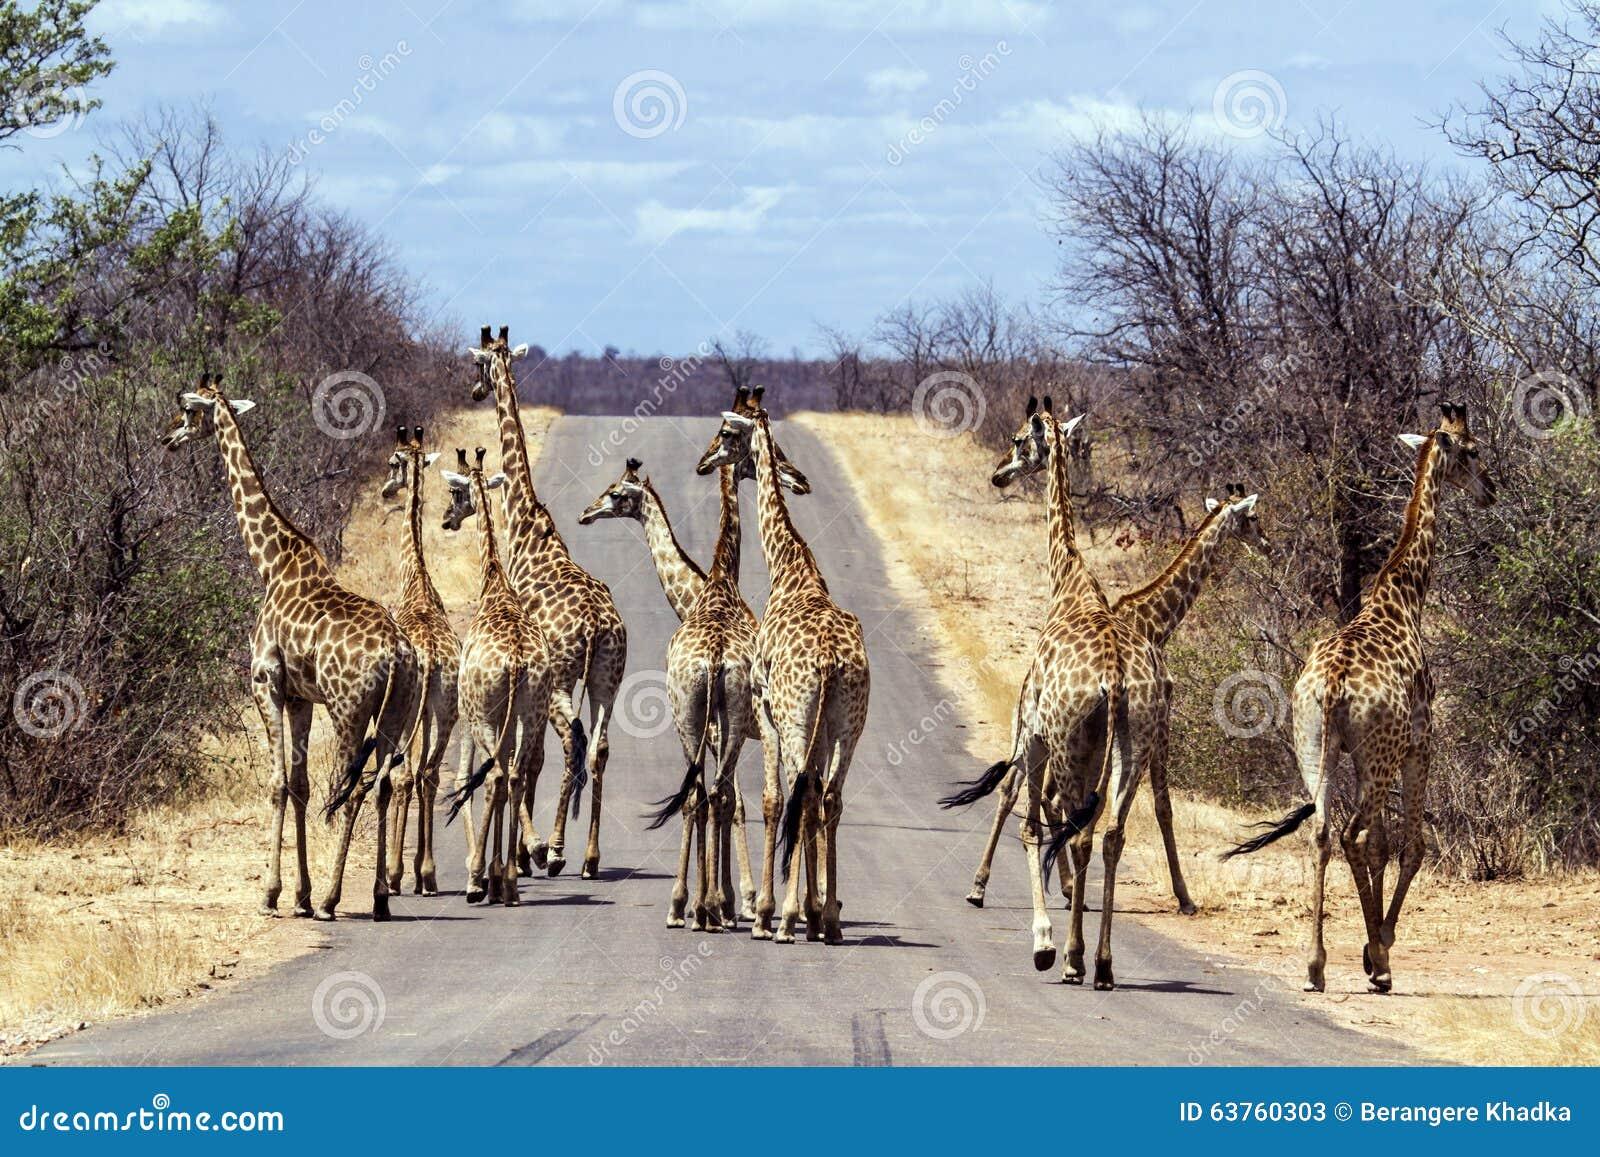 Big group of Giraffes in Kruger National park, South Africa